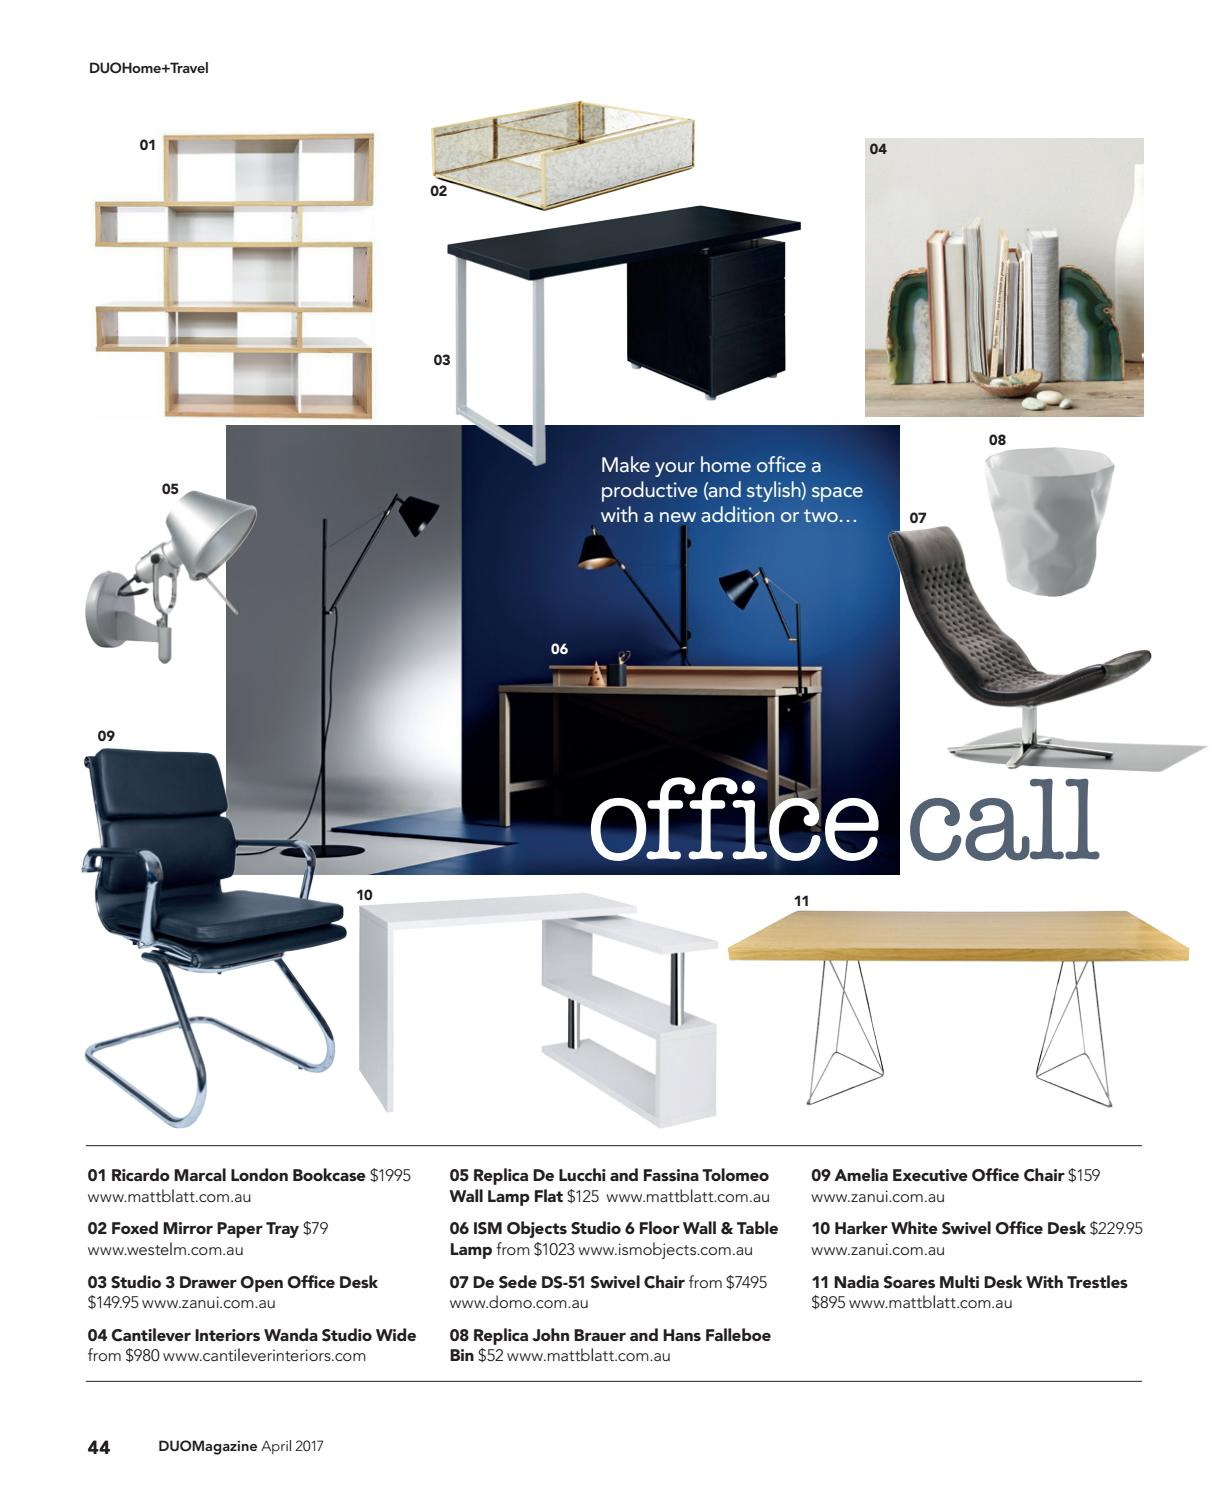 zanui desk chair tall high duo magazine april 2017 by issuu